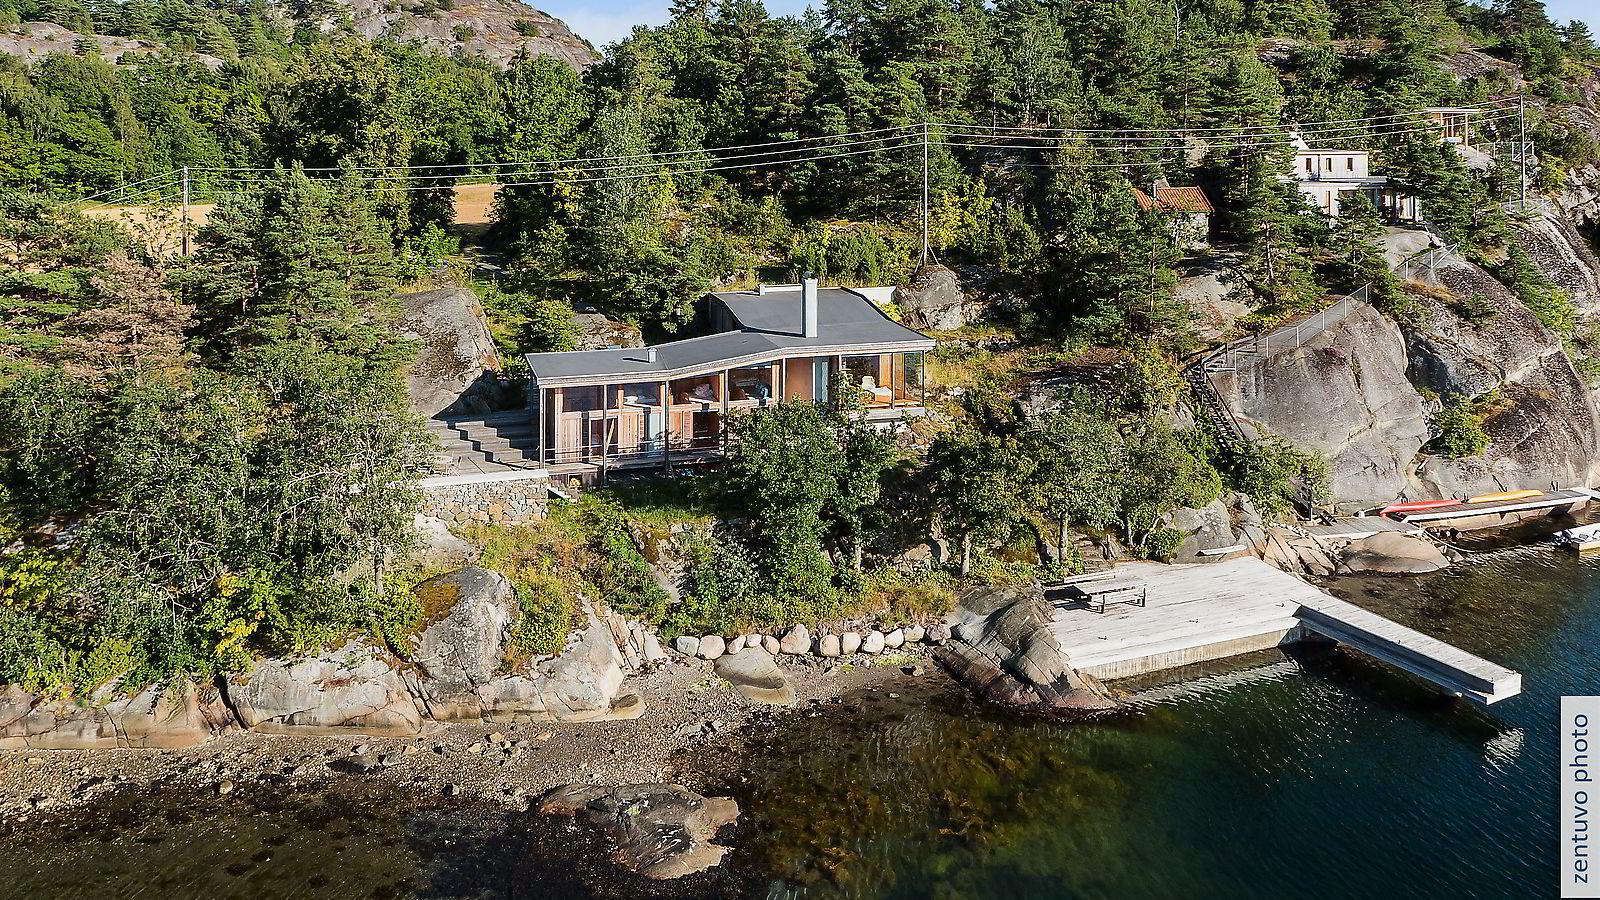 Hytta i Øyaveien i Sandefjord hadde en prisantydning på 20 millioner kroner, men ble nylig solgt 16,5 millioner.